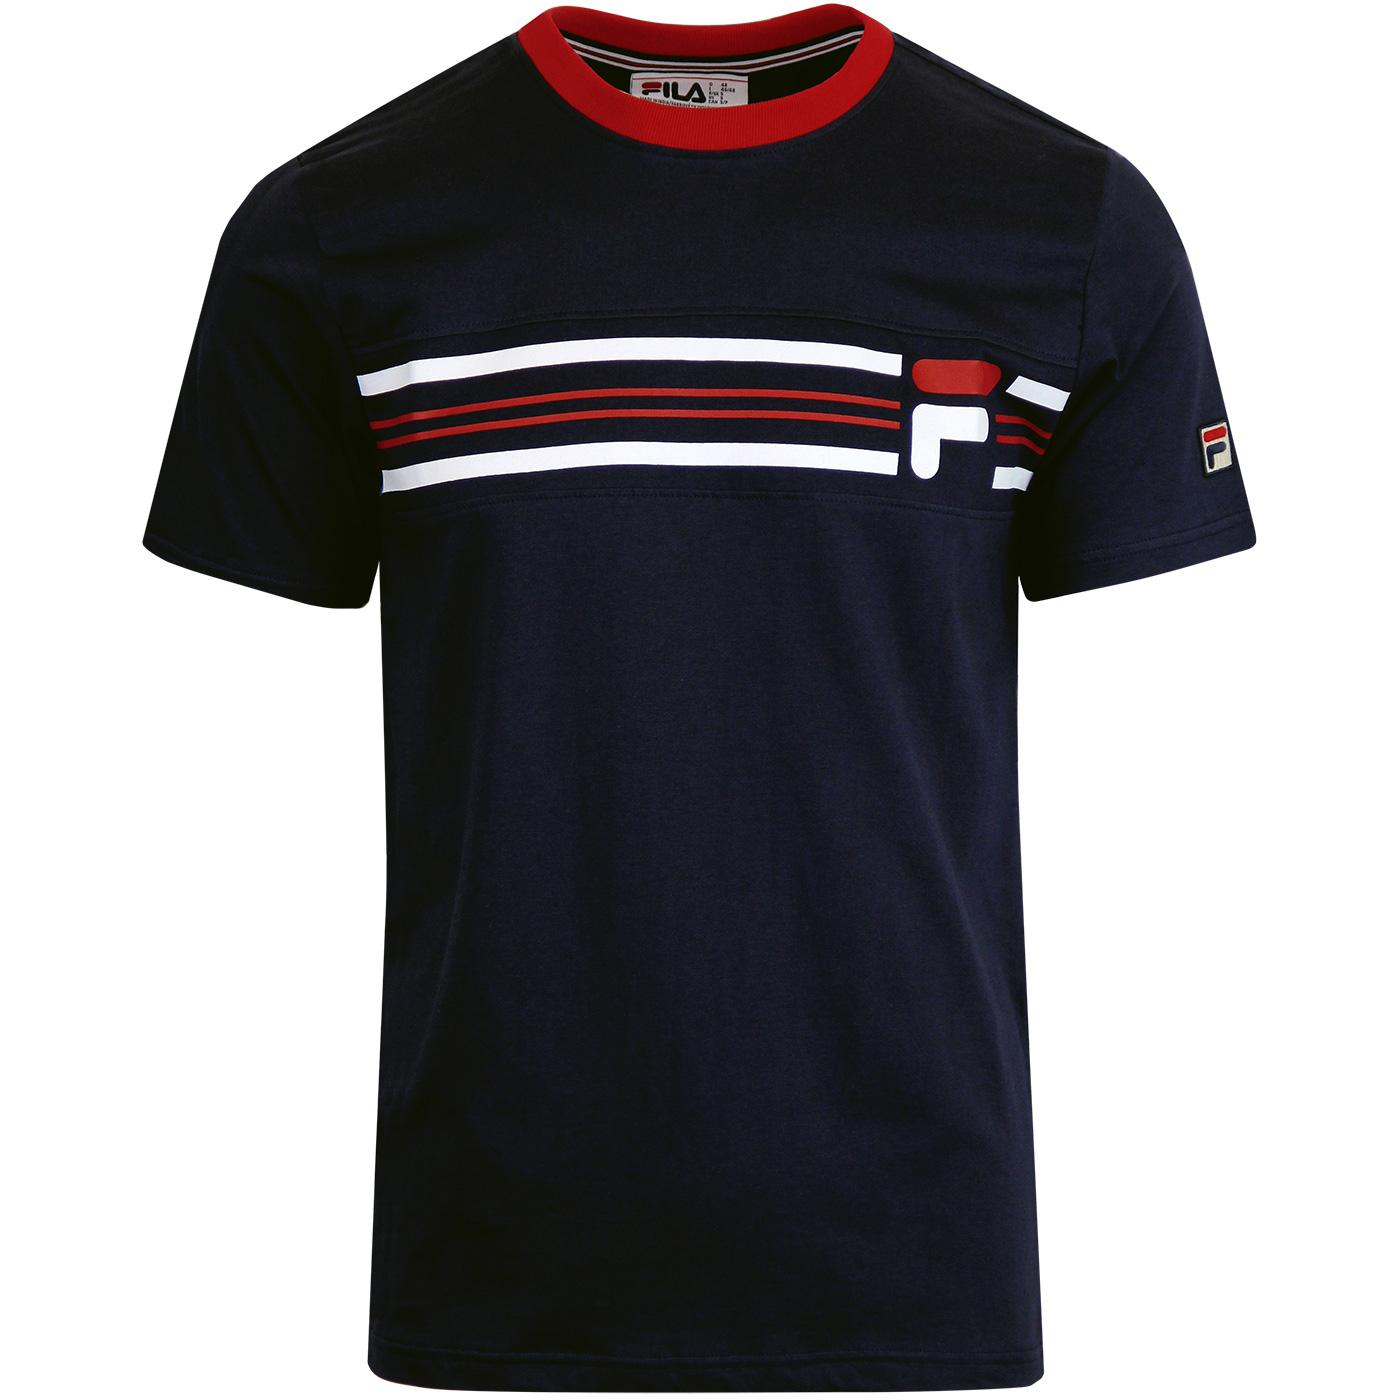 Bruno 3 FILA VINTAGE 1980s Cut & Sew T-shirt (P/R)